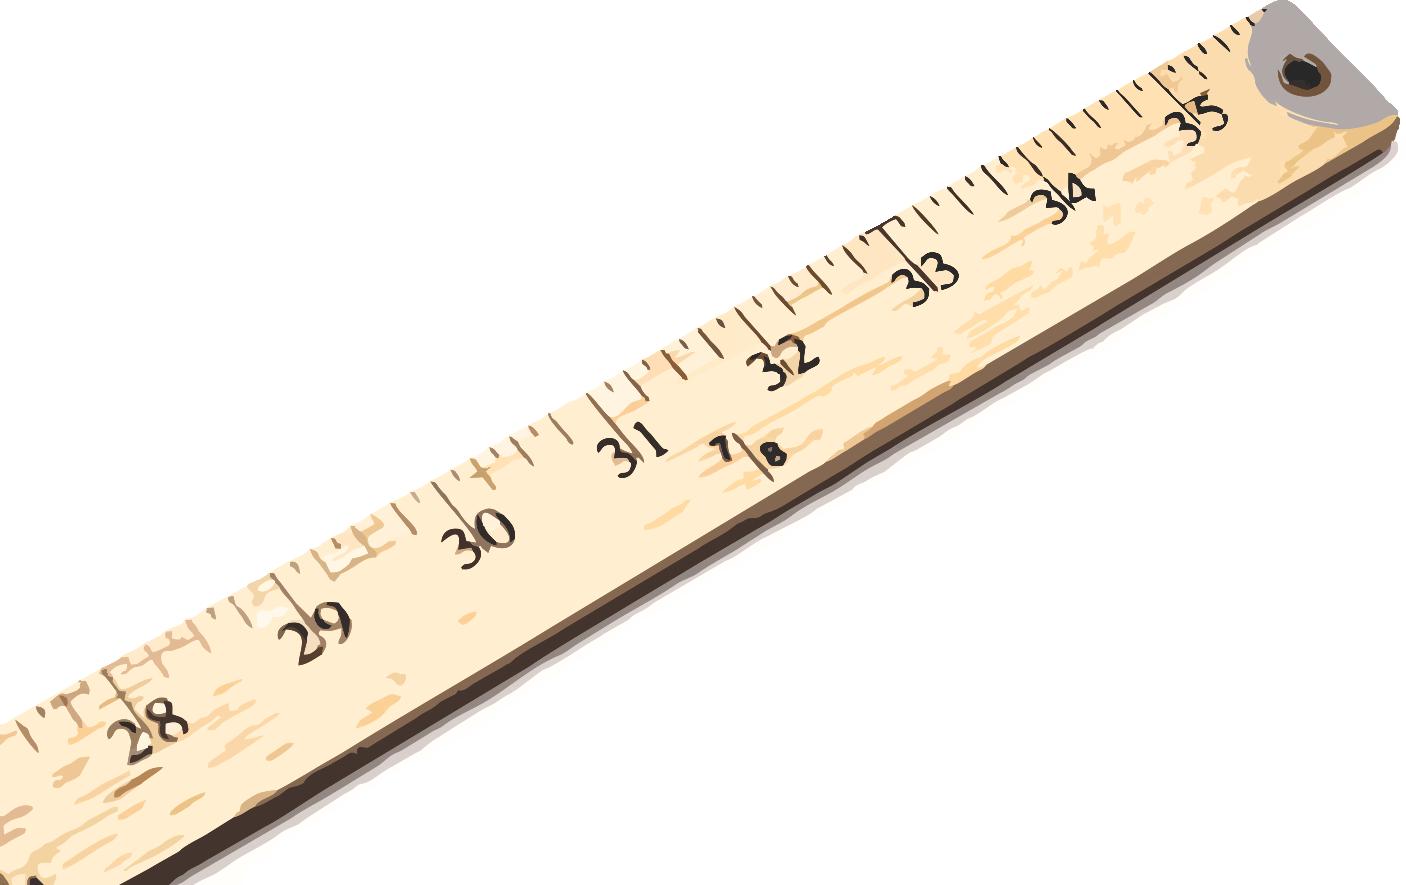 Clipart ruler yardstick. Patterns thumbnail image